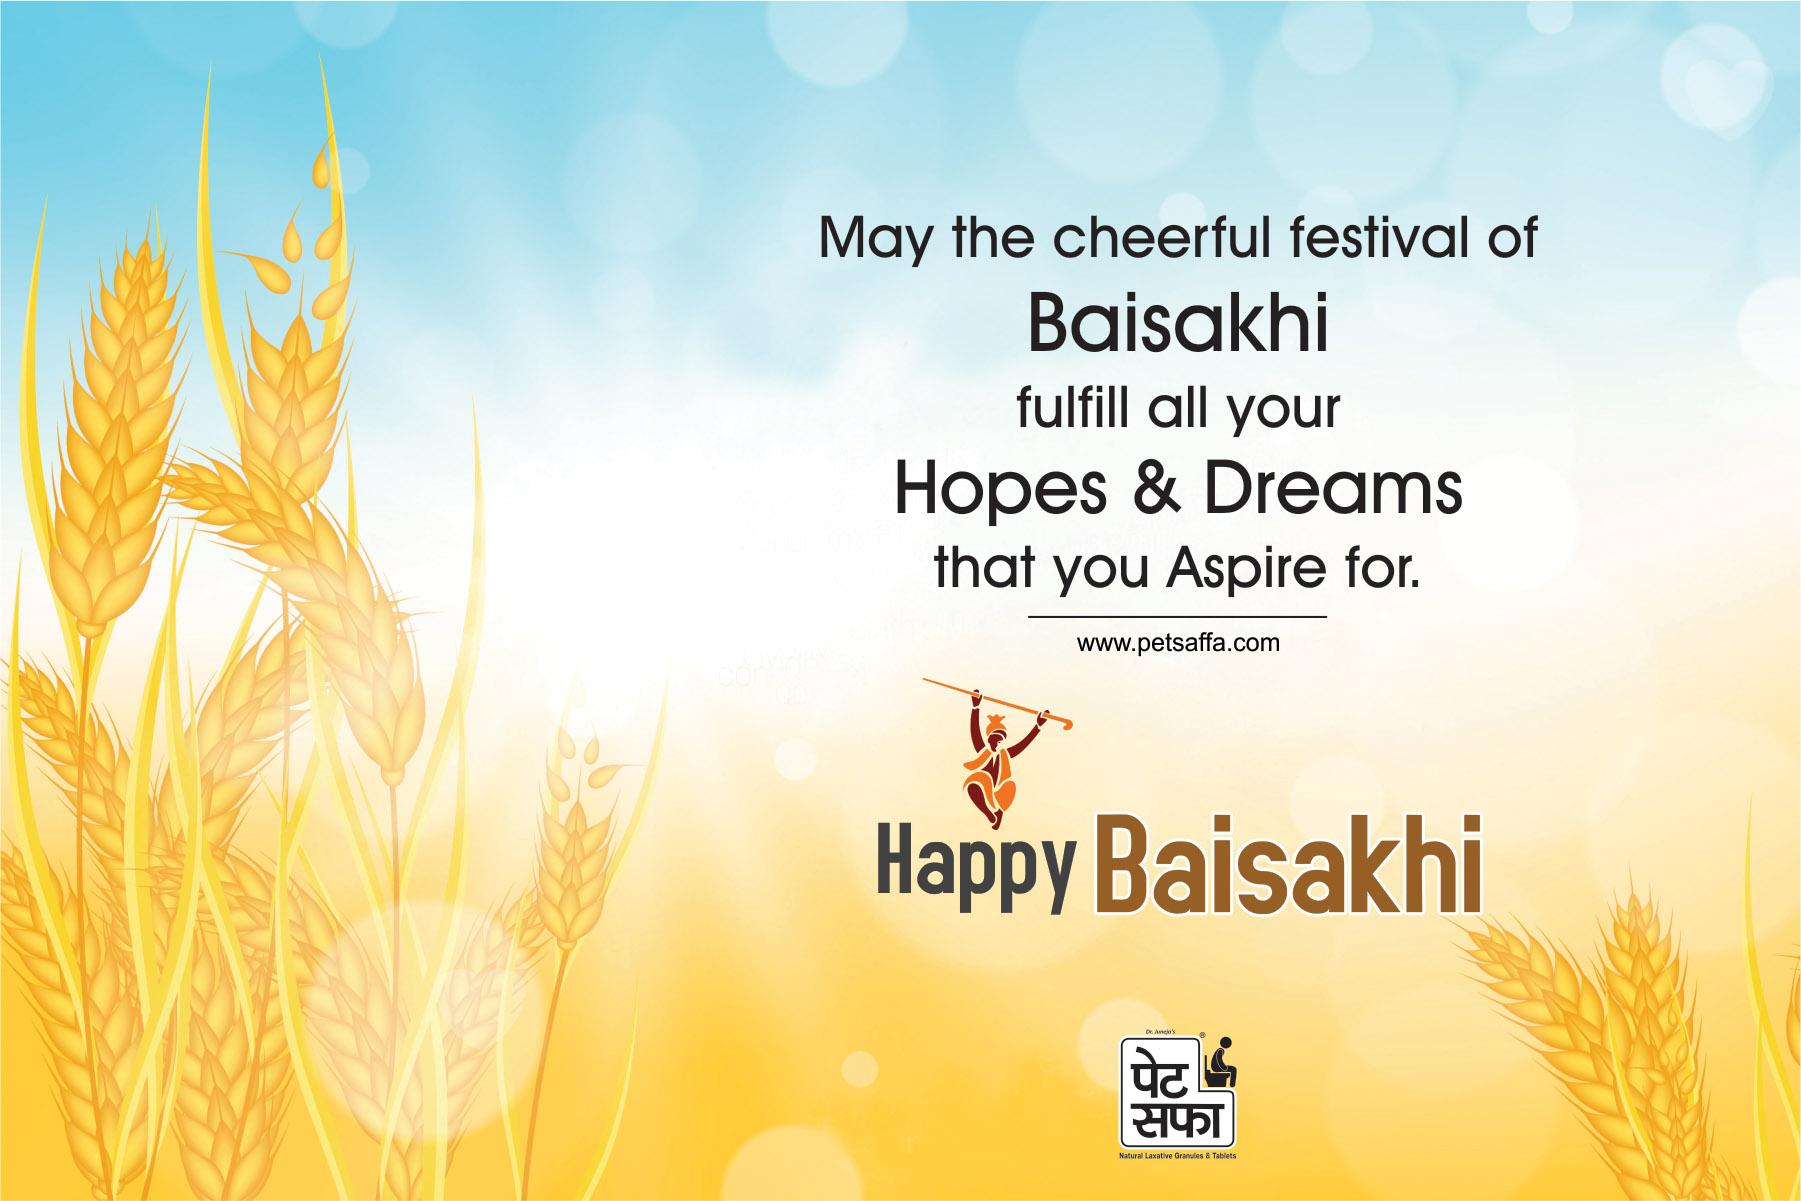 13 April 2018, Baisakhi Day, Pet Saffa, Indian Festival